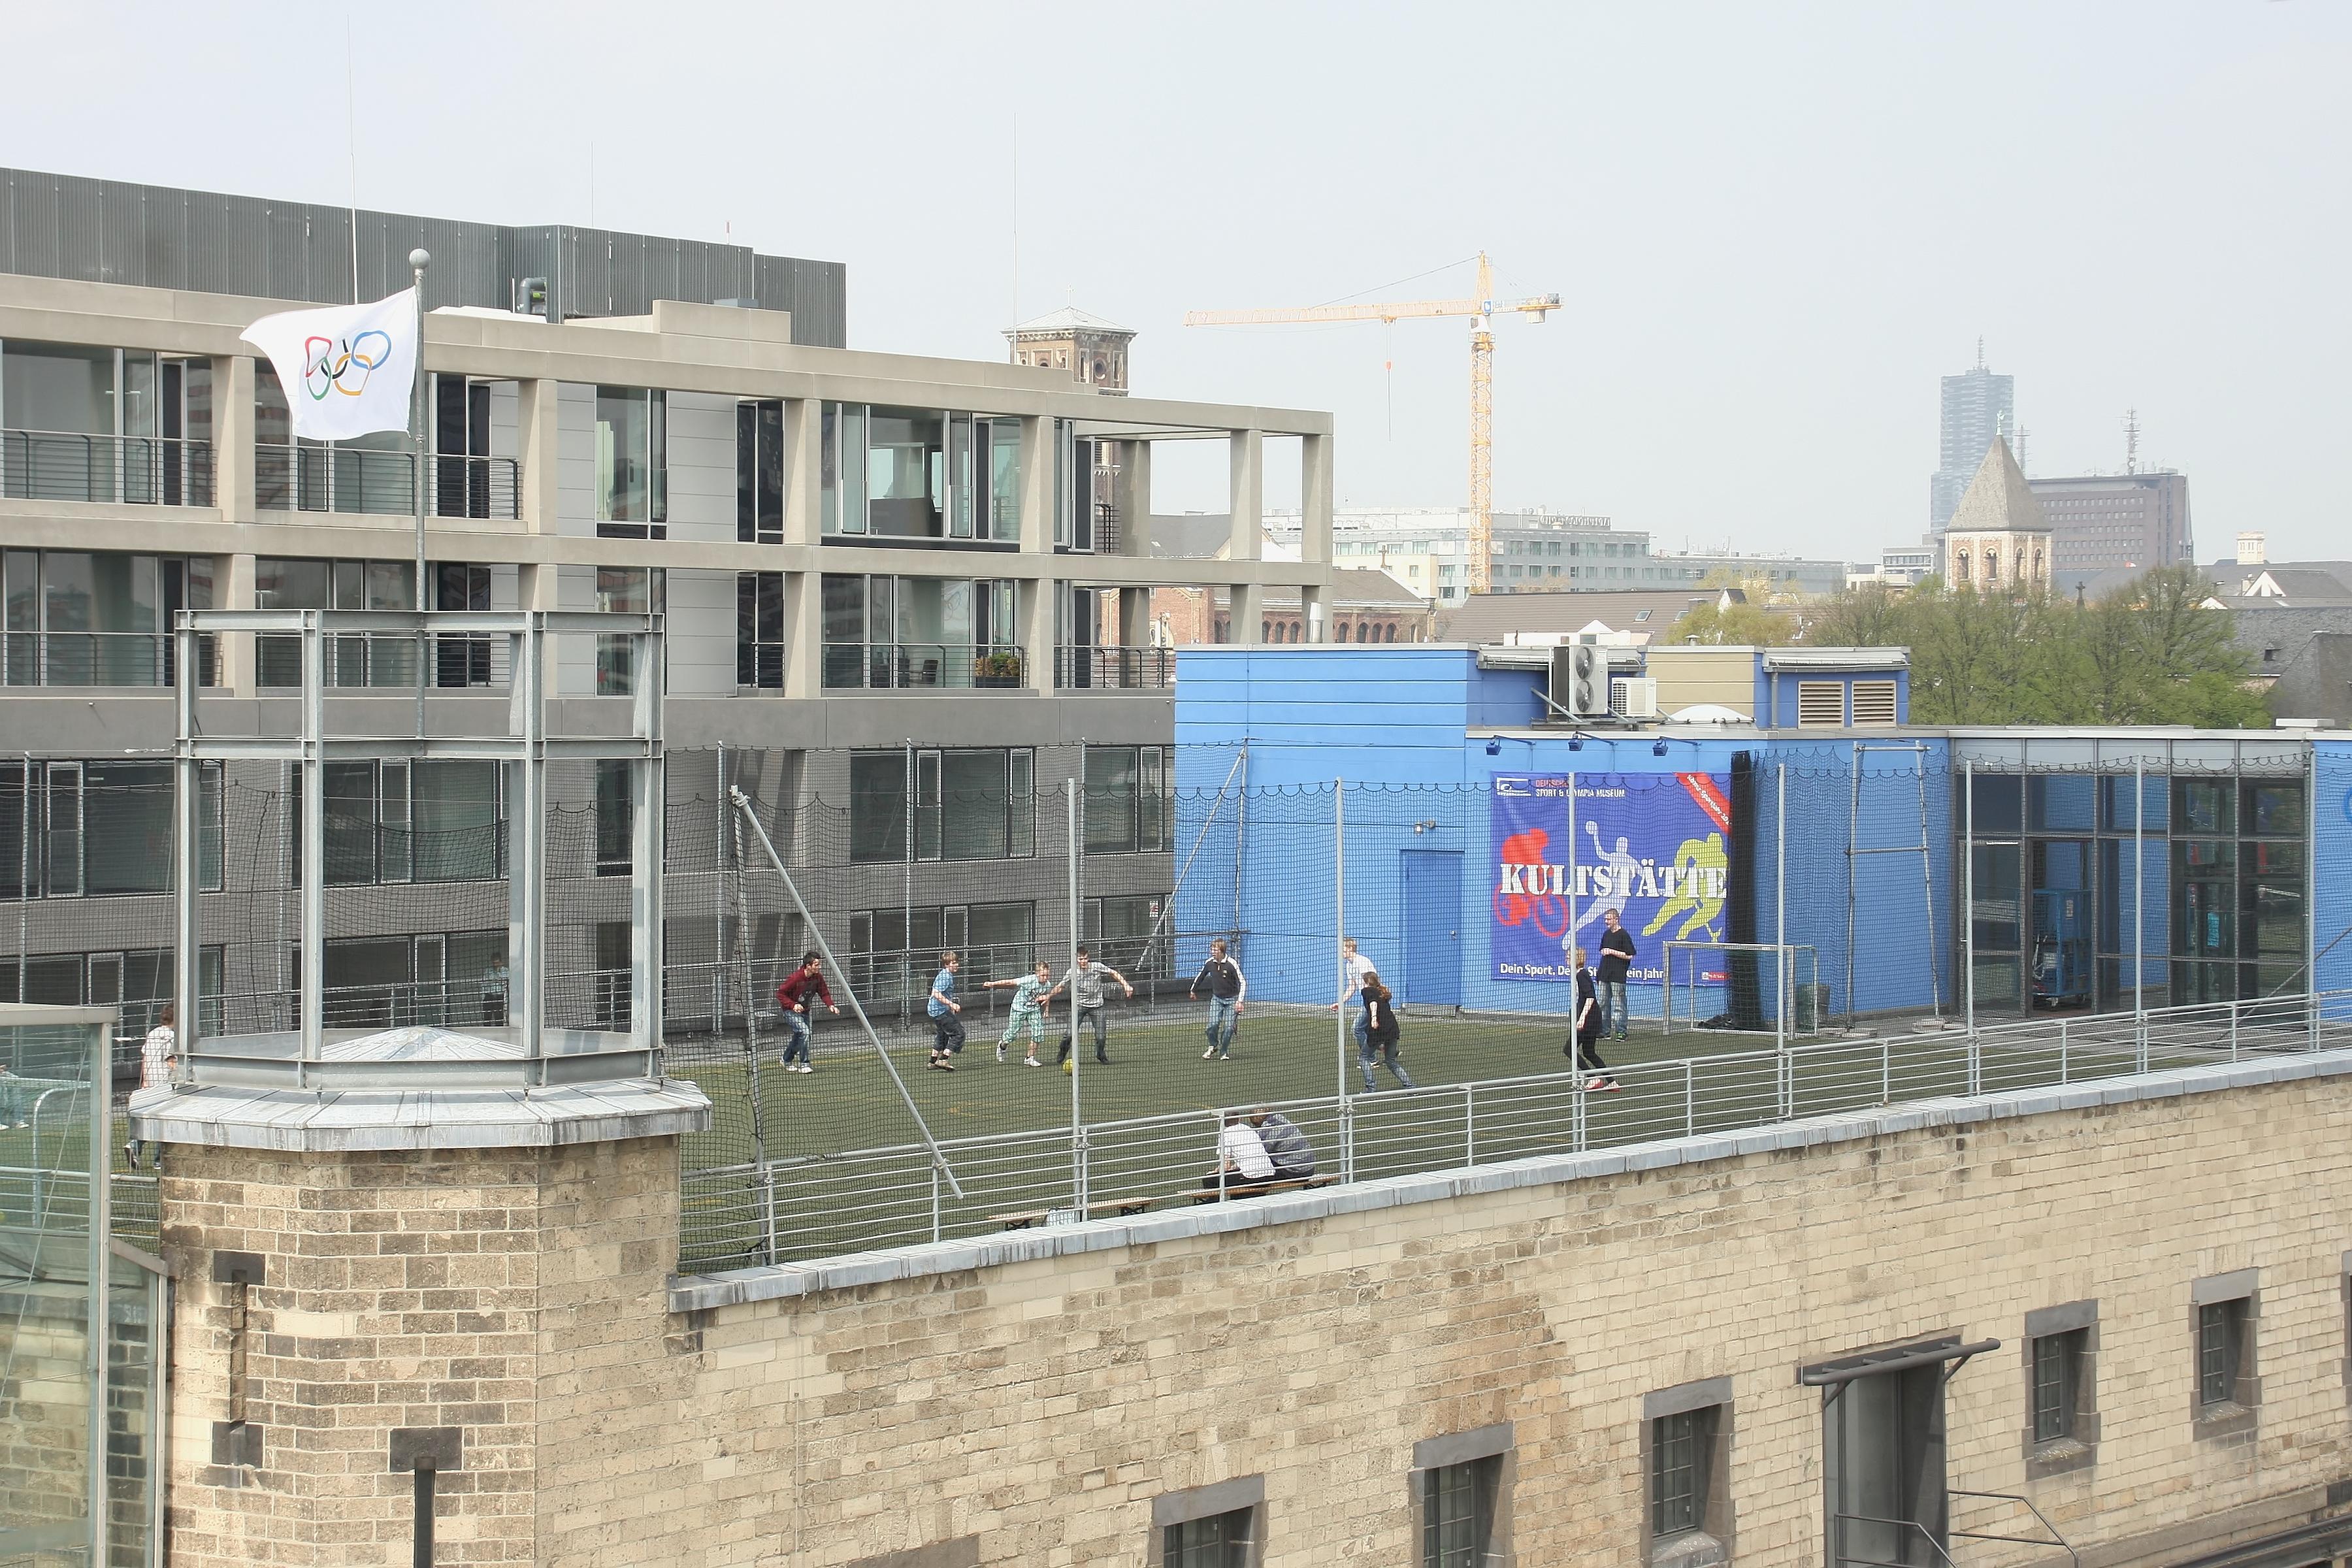 file rheinauhafen sport und olympiamuseum sportplatz auf dem dach 8713 jpg wikimedia